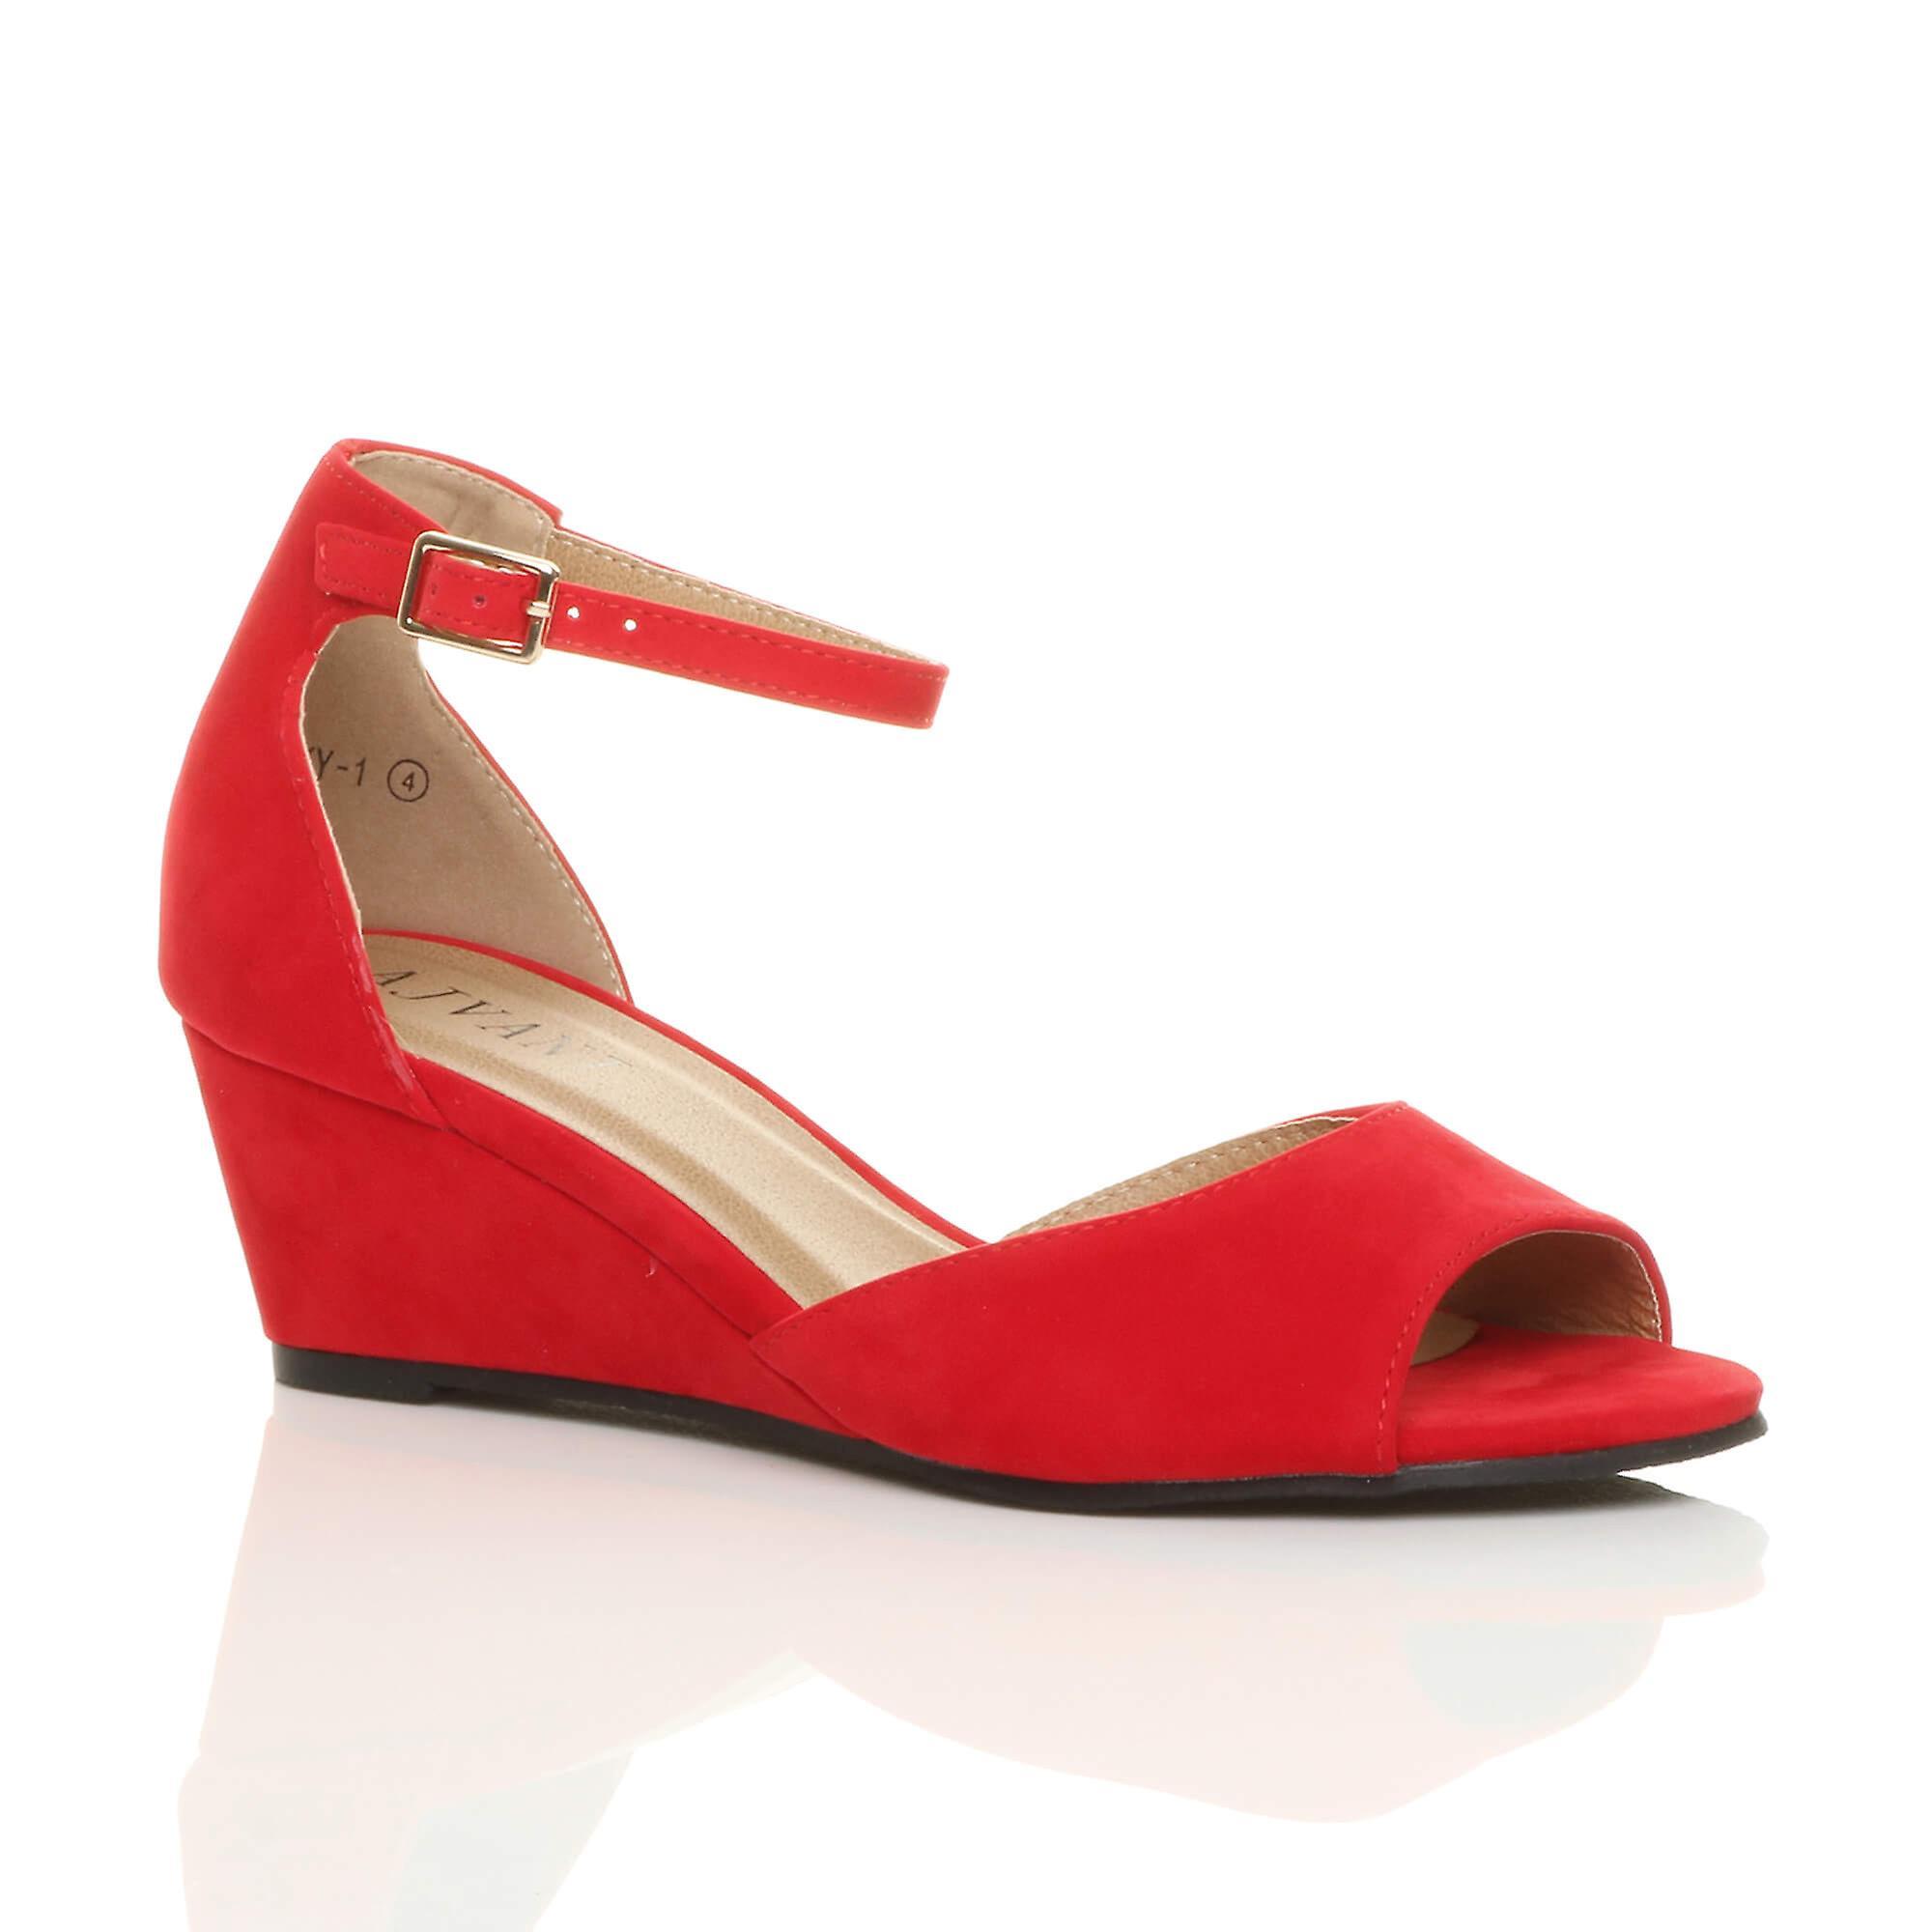 toe smart ankle wedge sandals Ajvani peep casual evening strap mid womens low heel S4wzRqY